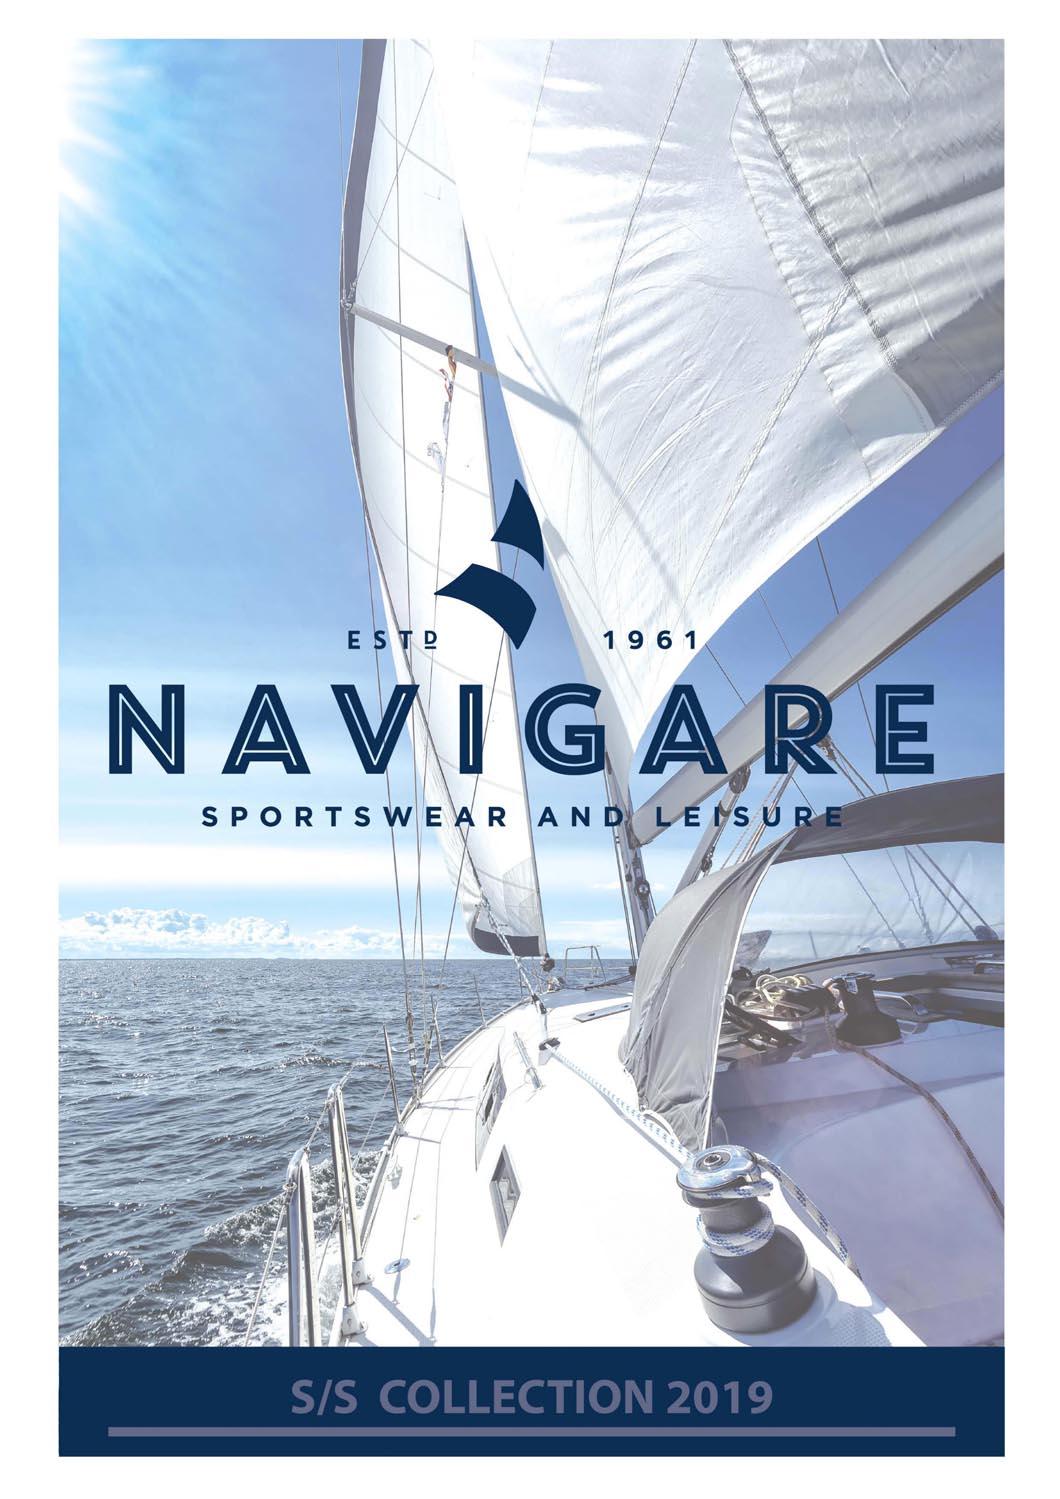 NAVIGARE BEACHWEAR P/E 19